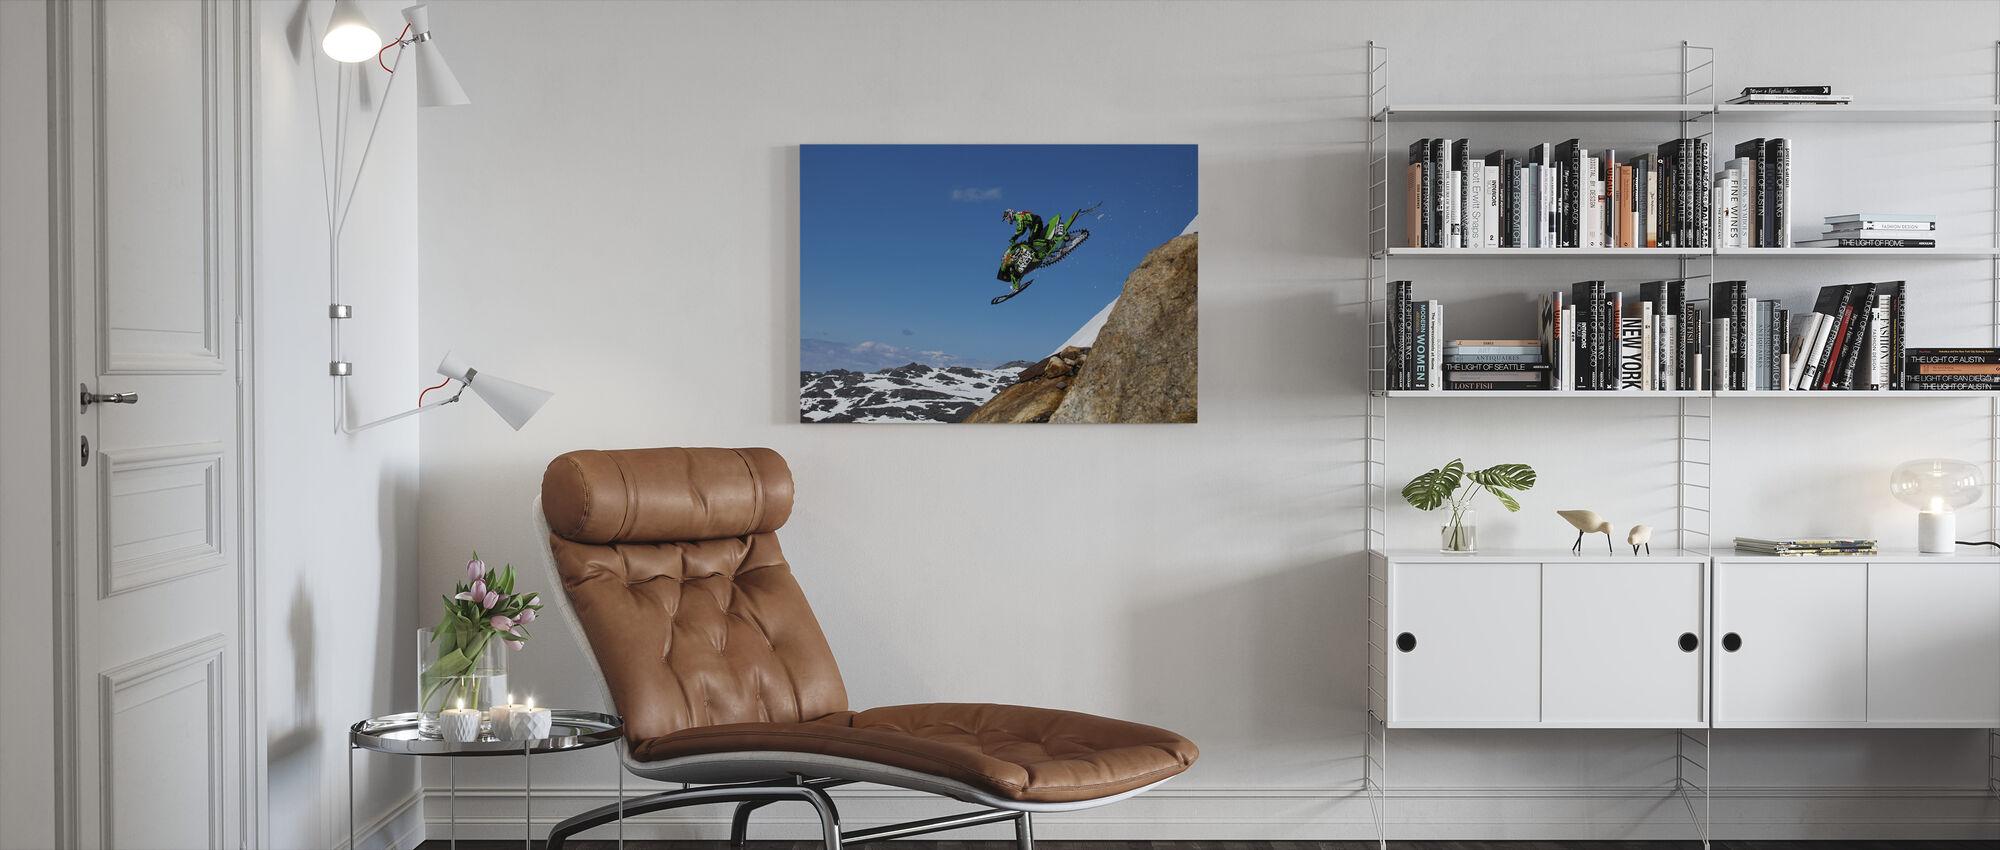 Free Fall - Canvas print - Living Room